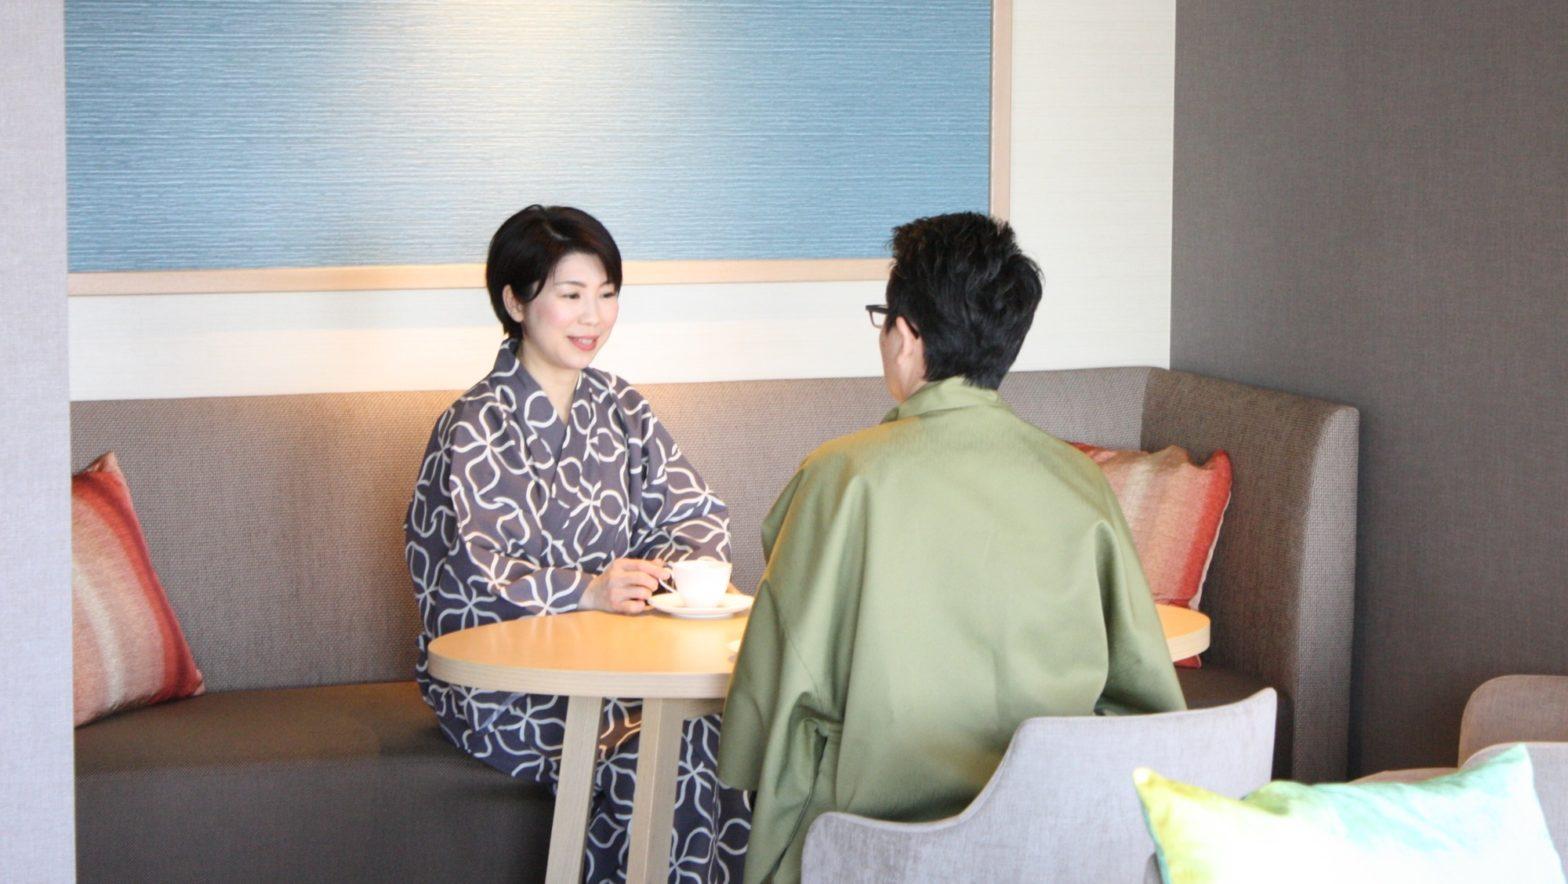 Information on rental yukata